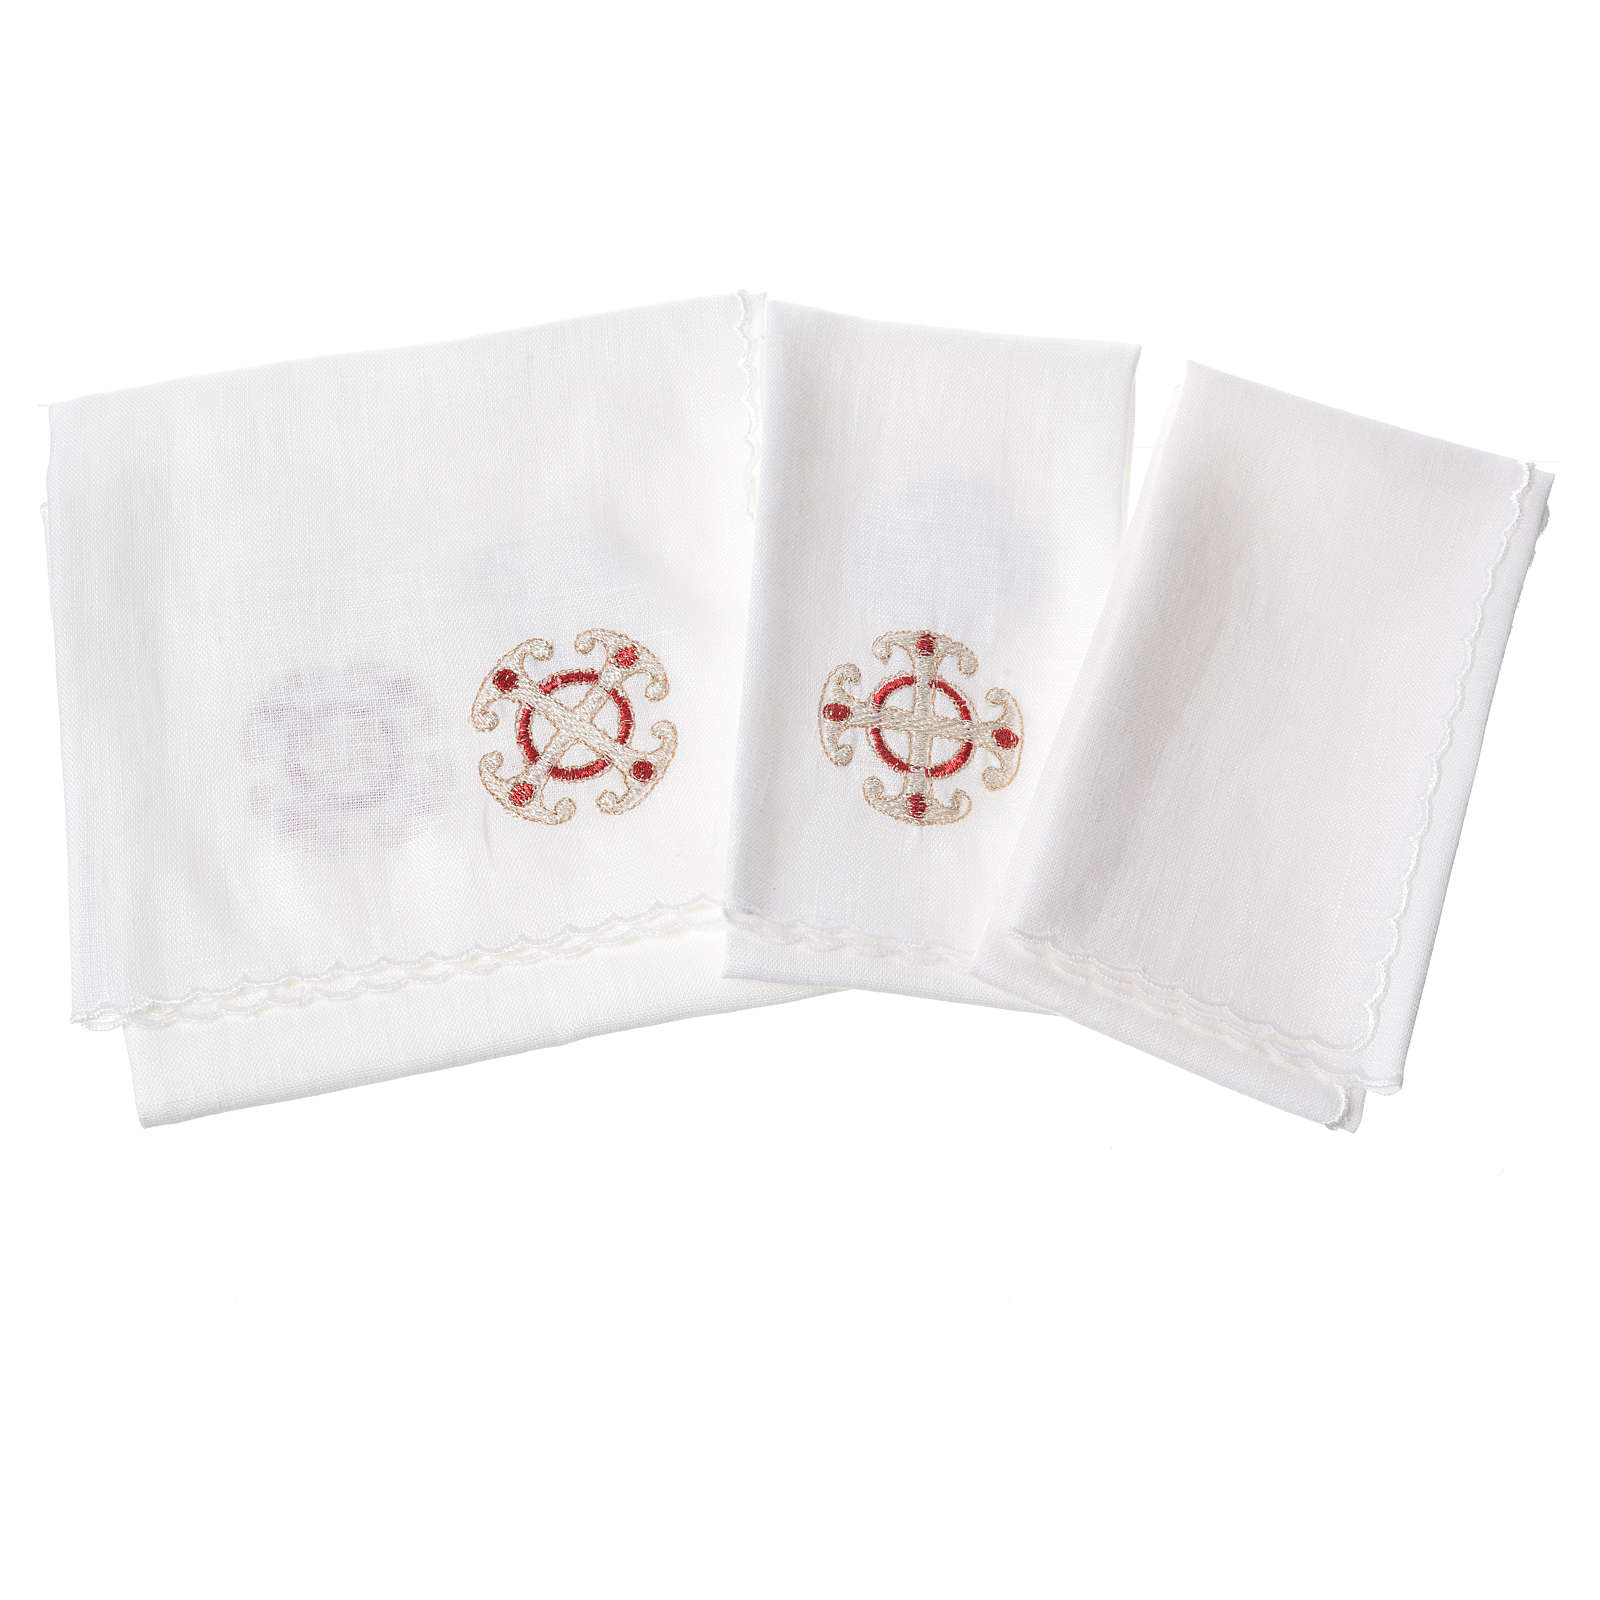 Altar linens set, 100% linen, cross and decorations 4